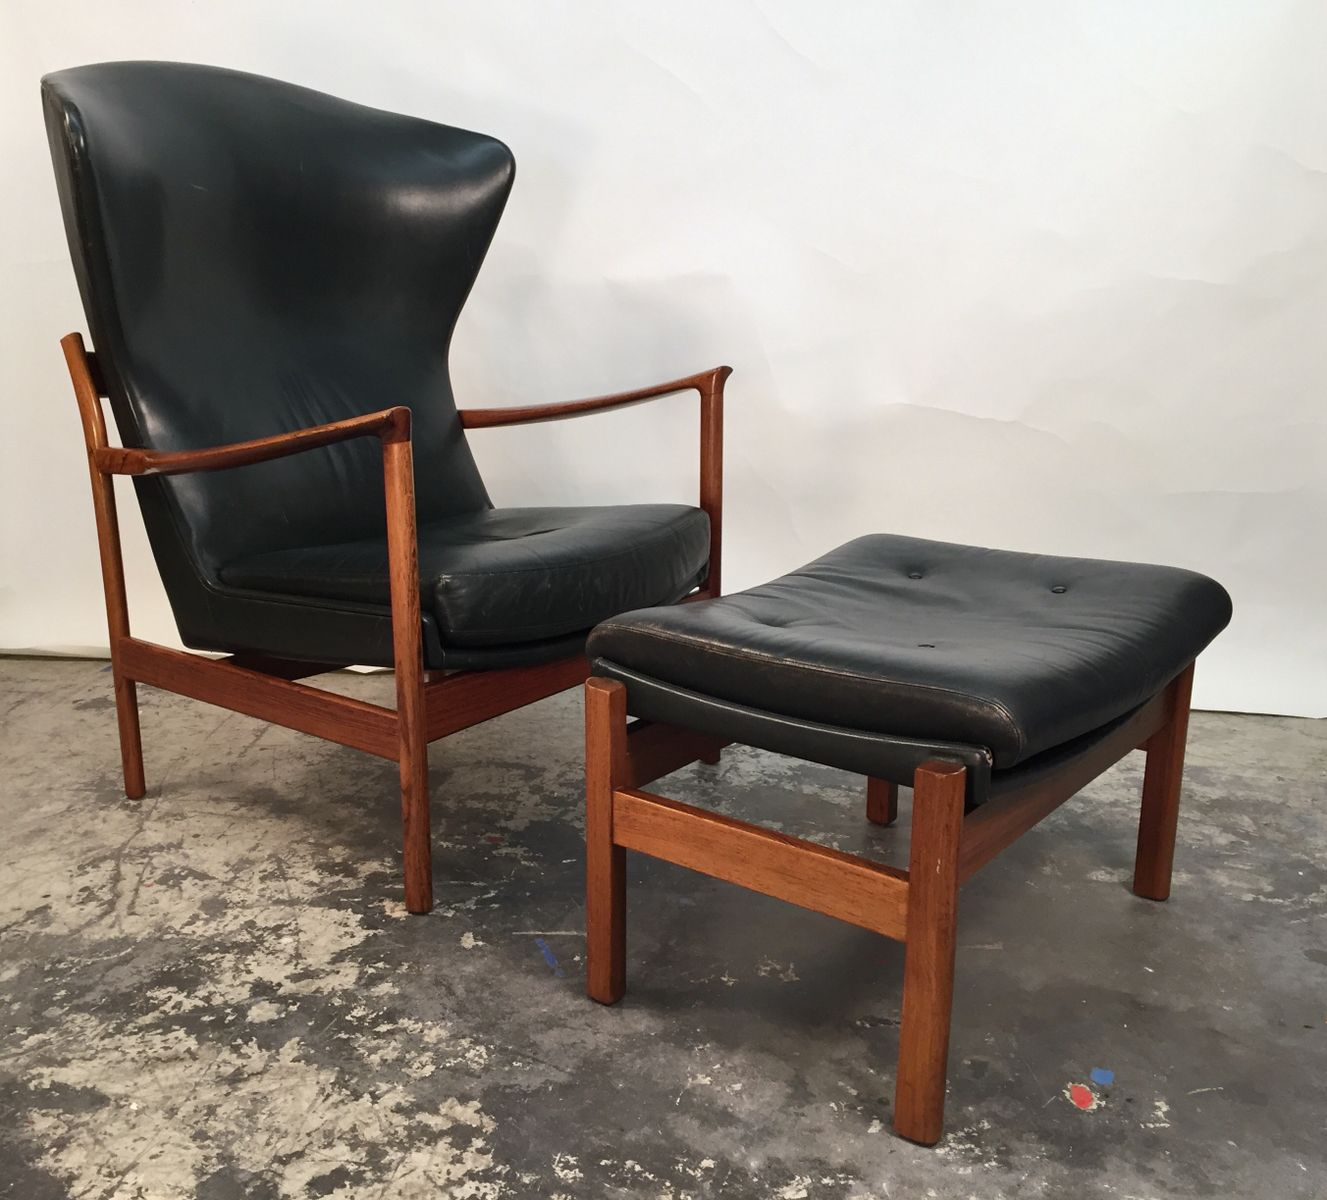 Swedish Lounge Chair With Ottoman, 1960s